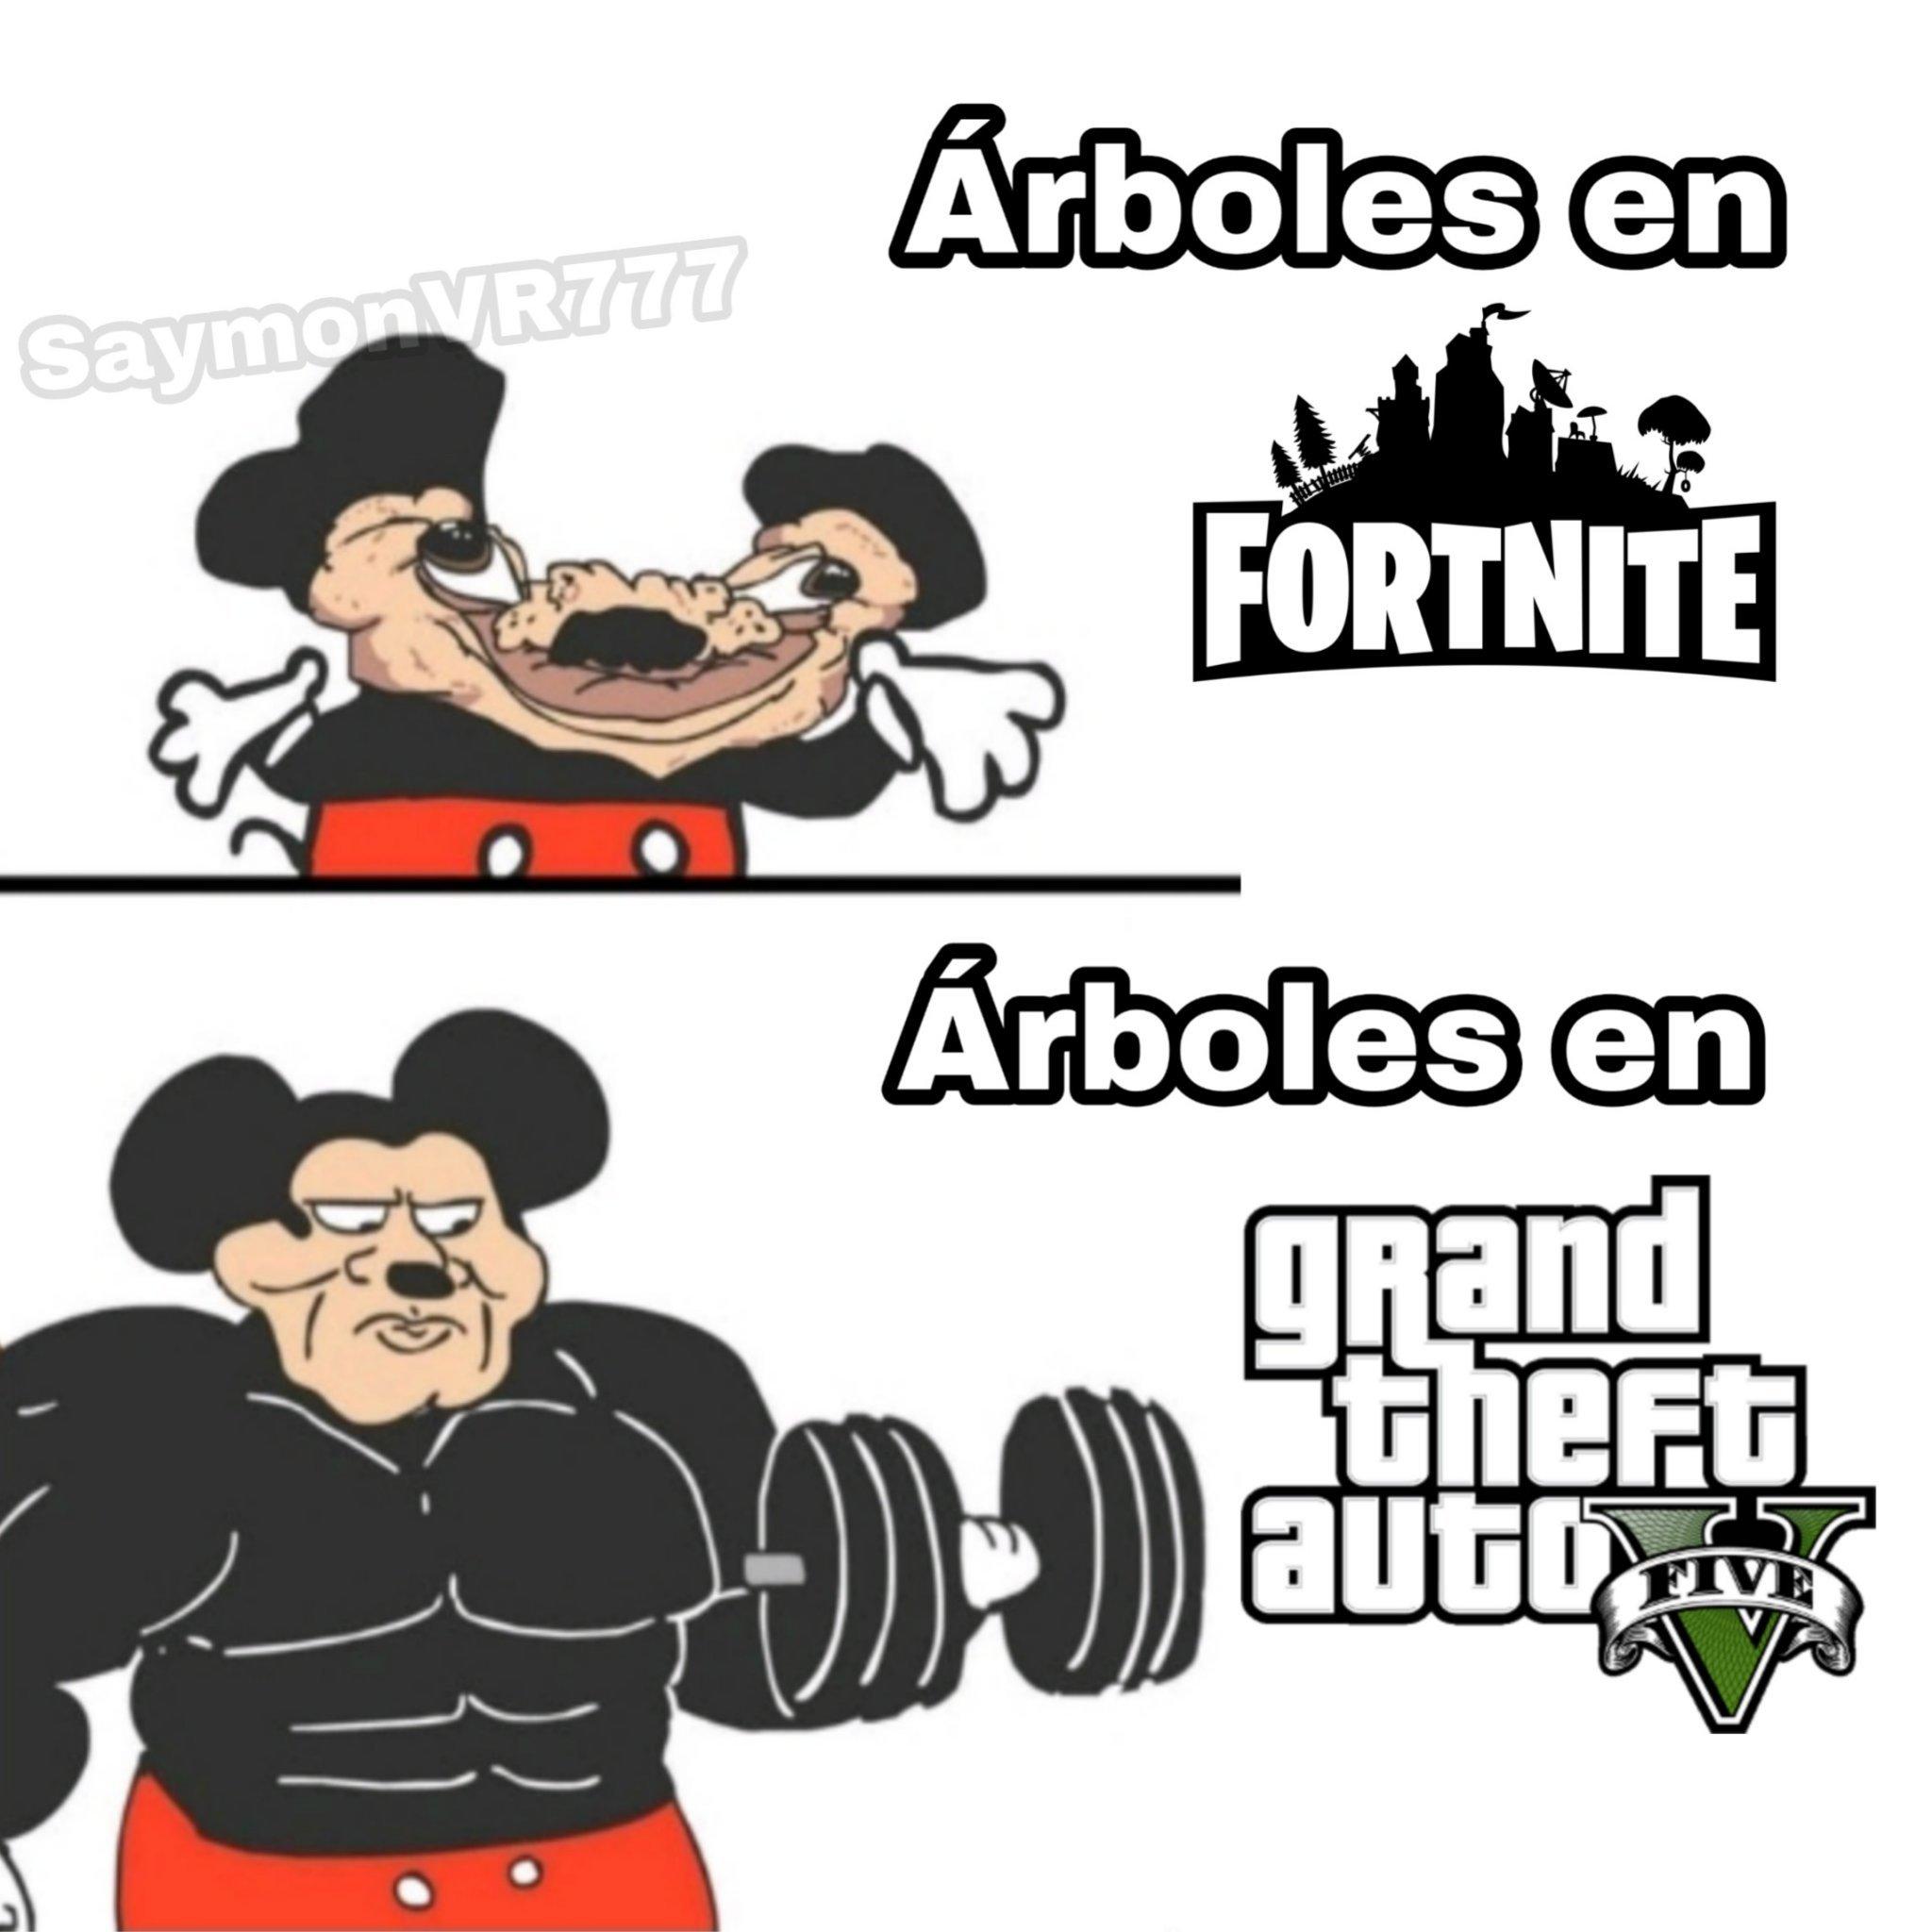 Una gran diferencia - meme